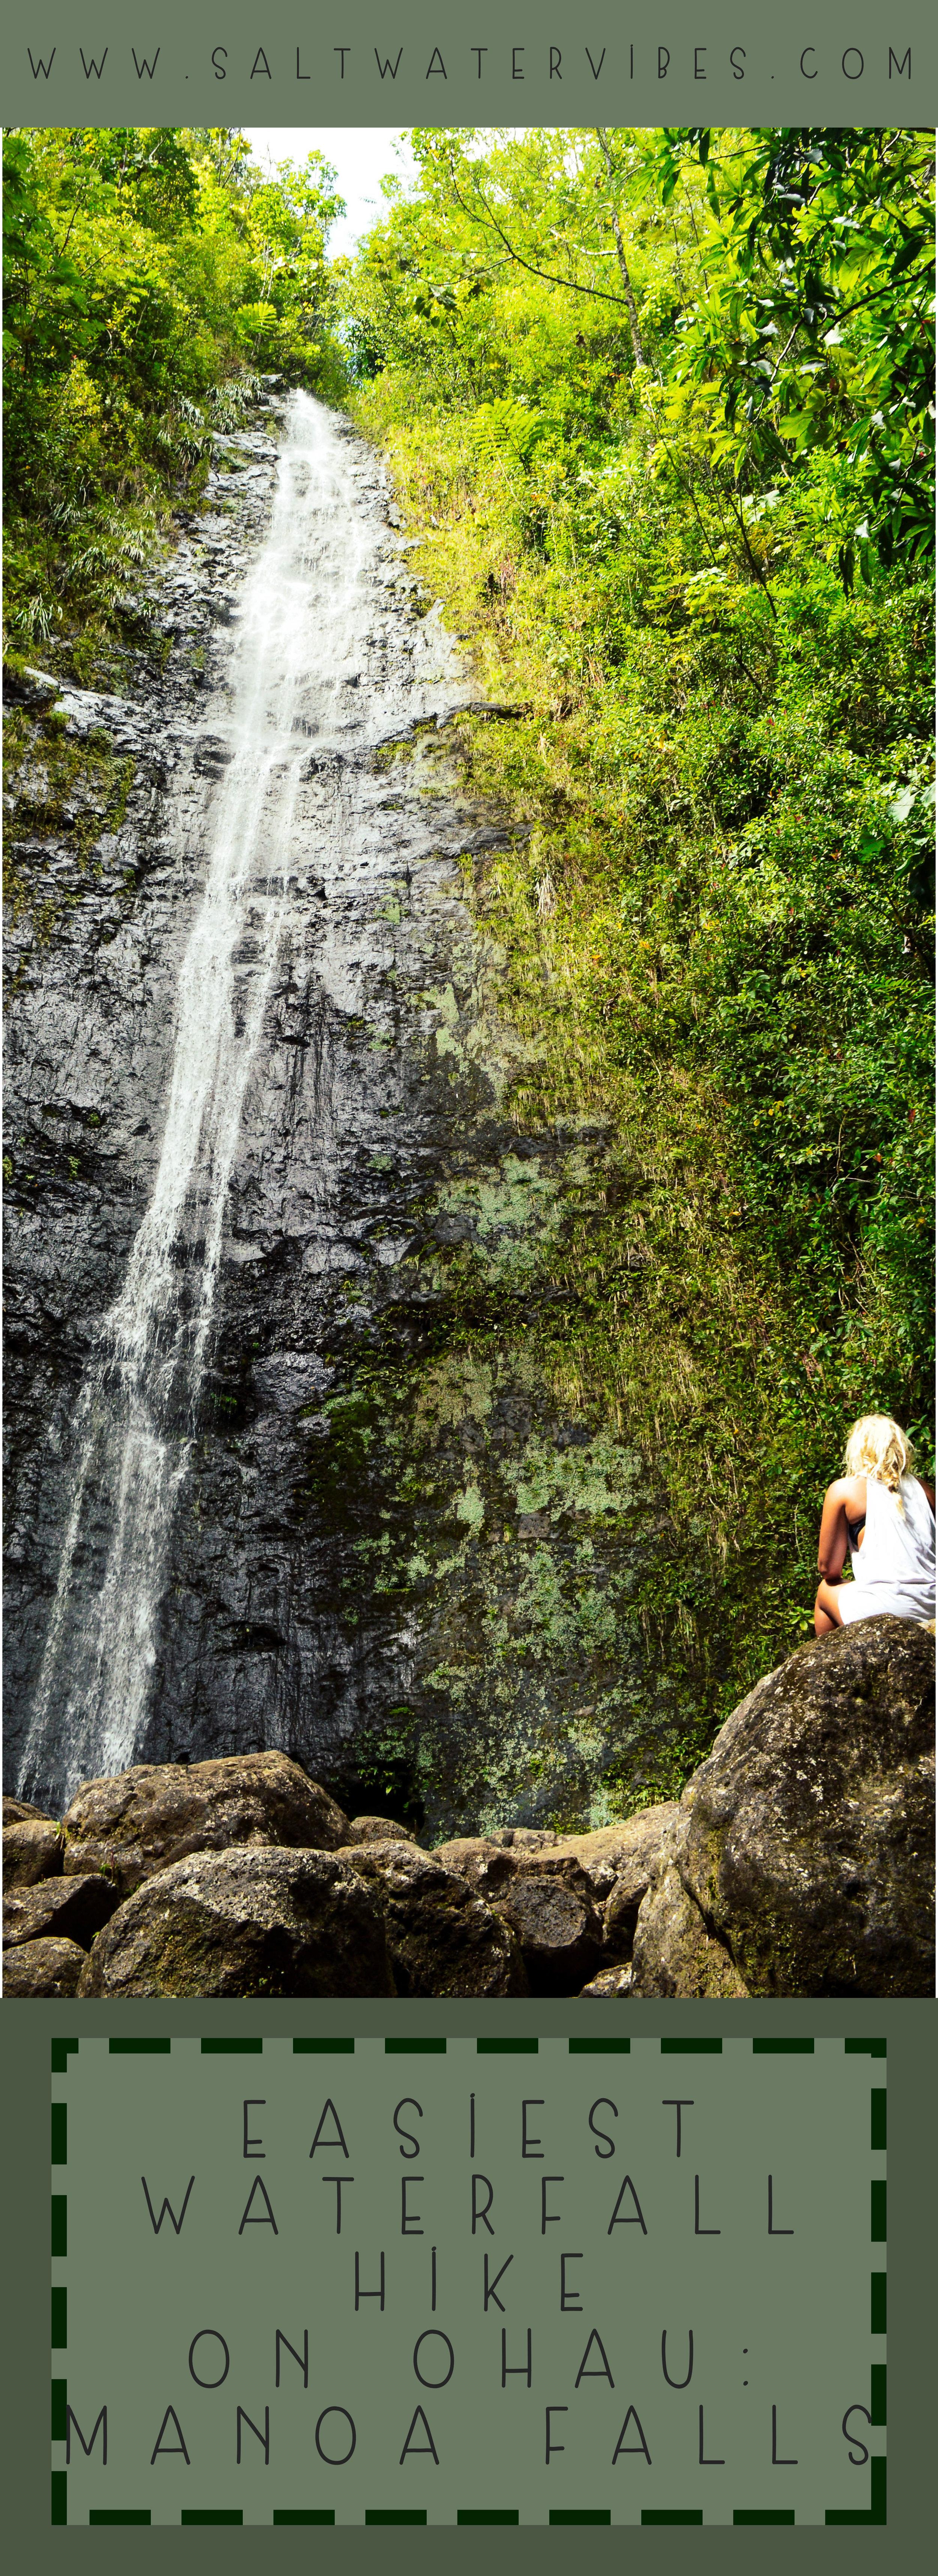 Manoa Falls Hike on Oahu + SaltWaterVibes